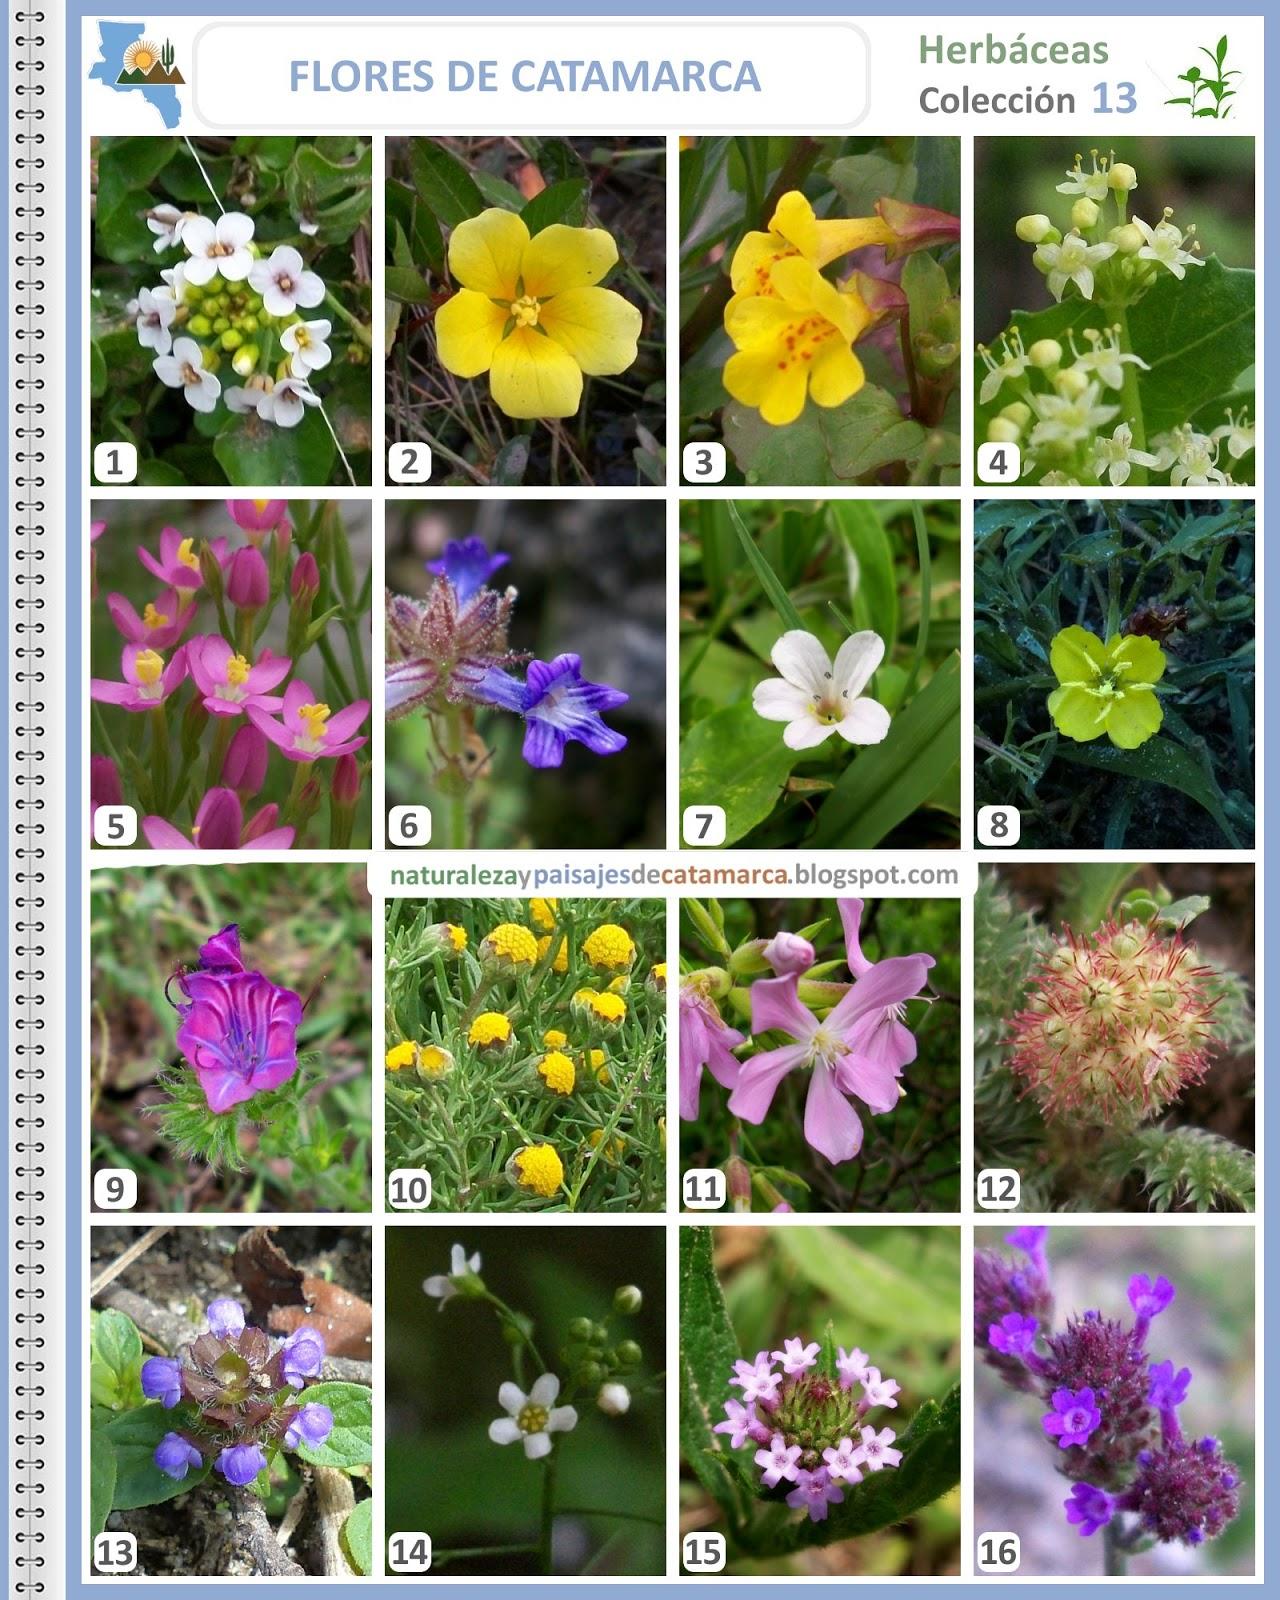 Naturaleza Y Paisajes De Catamarca Flores Silvestres De Catamarca